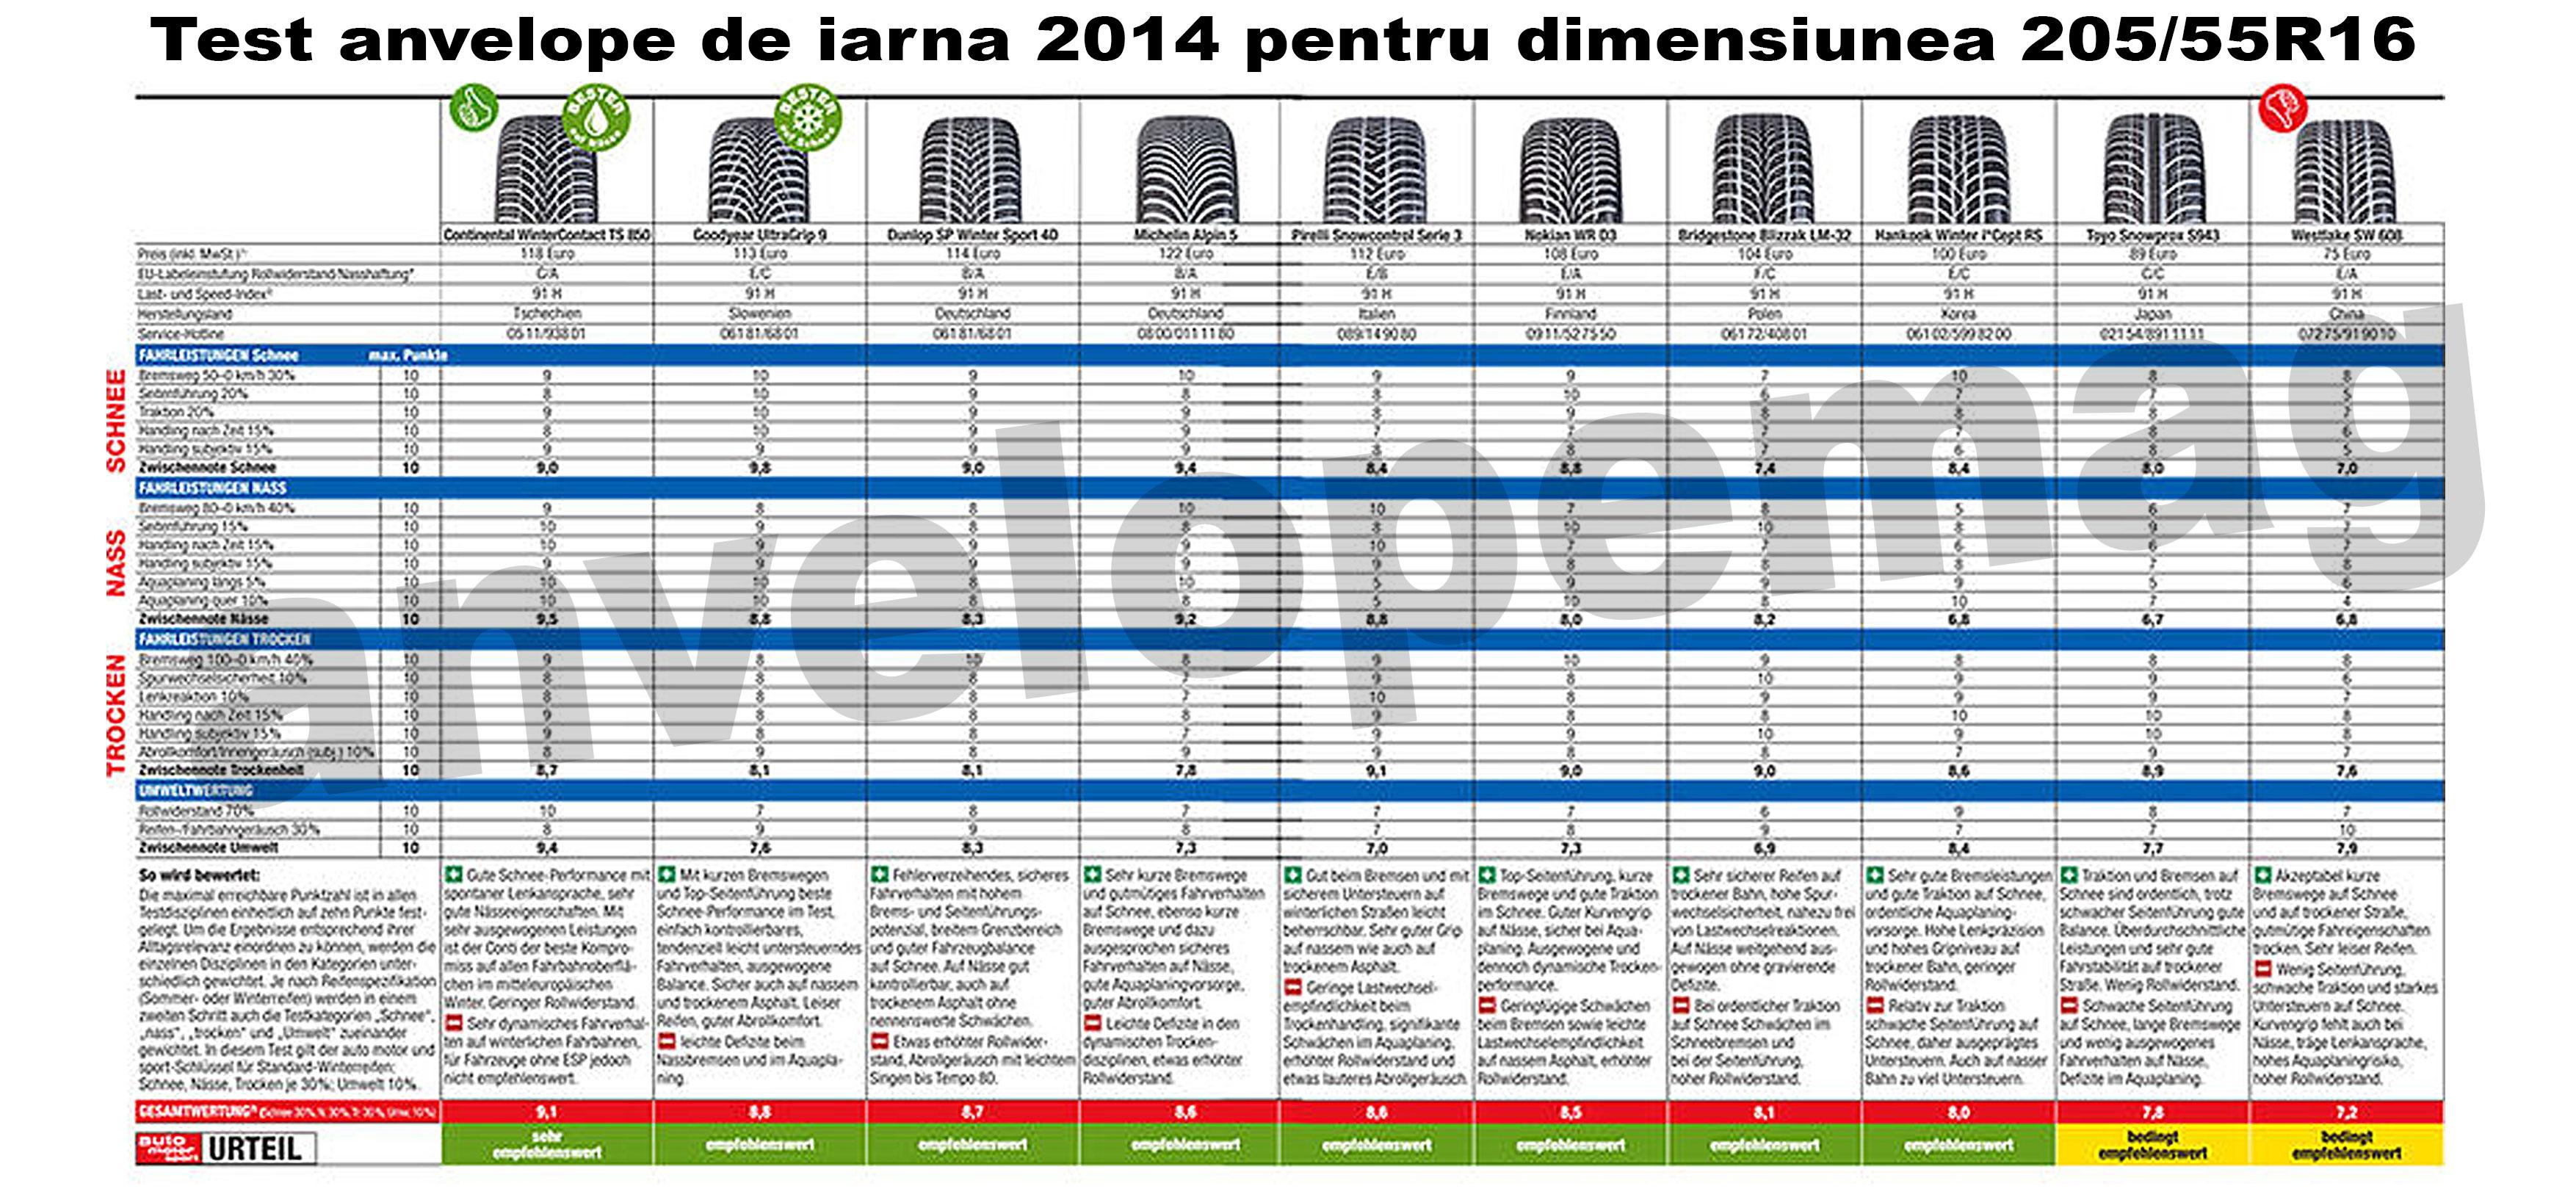 test anvelope de iarna 2014 205/55r16